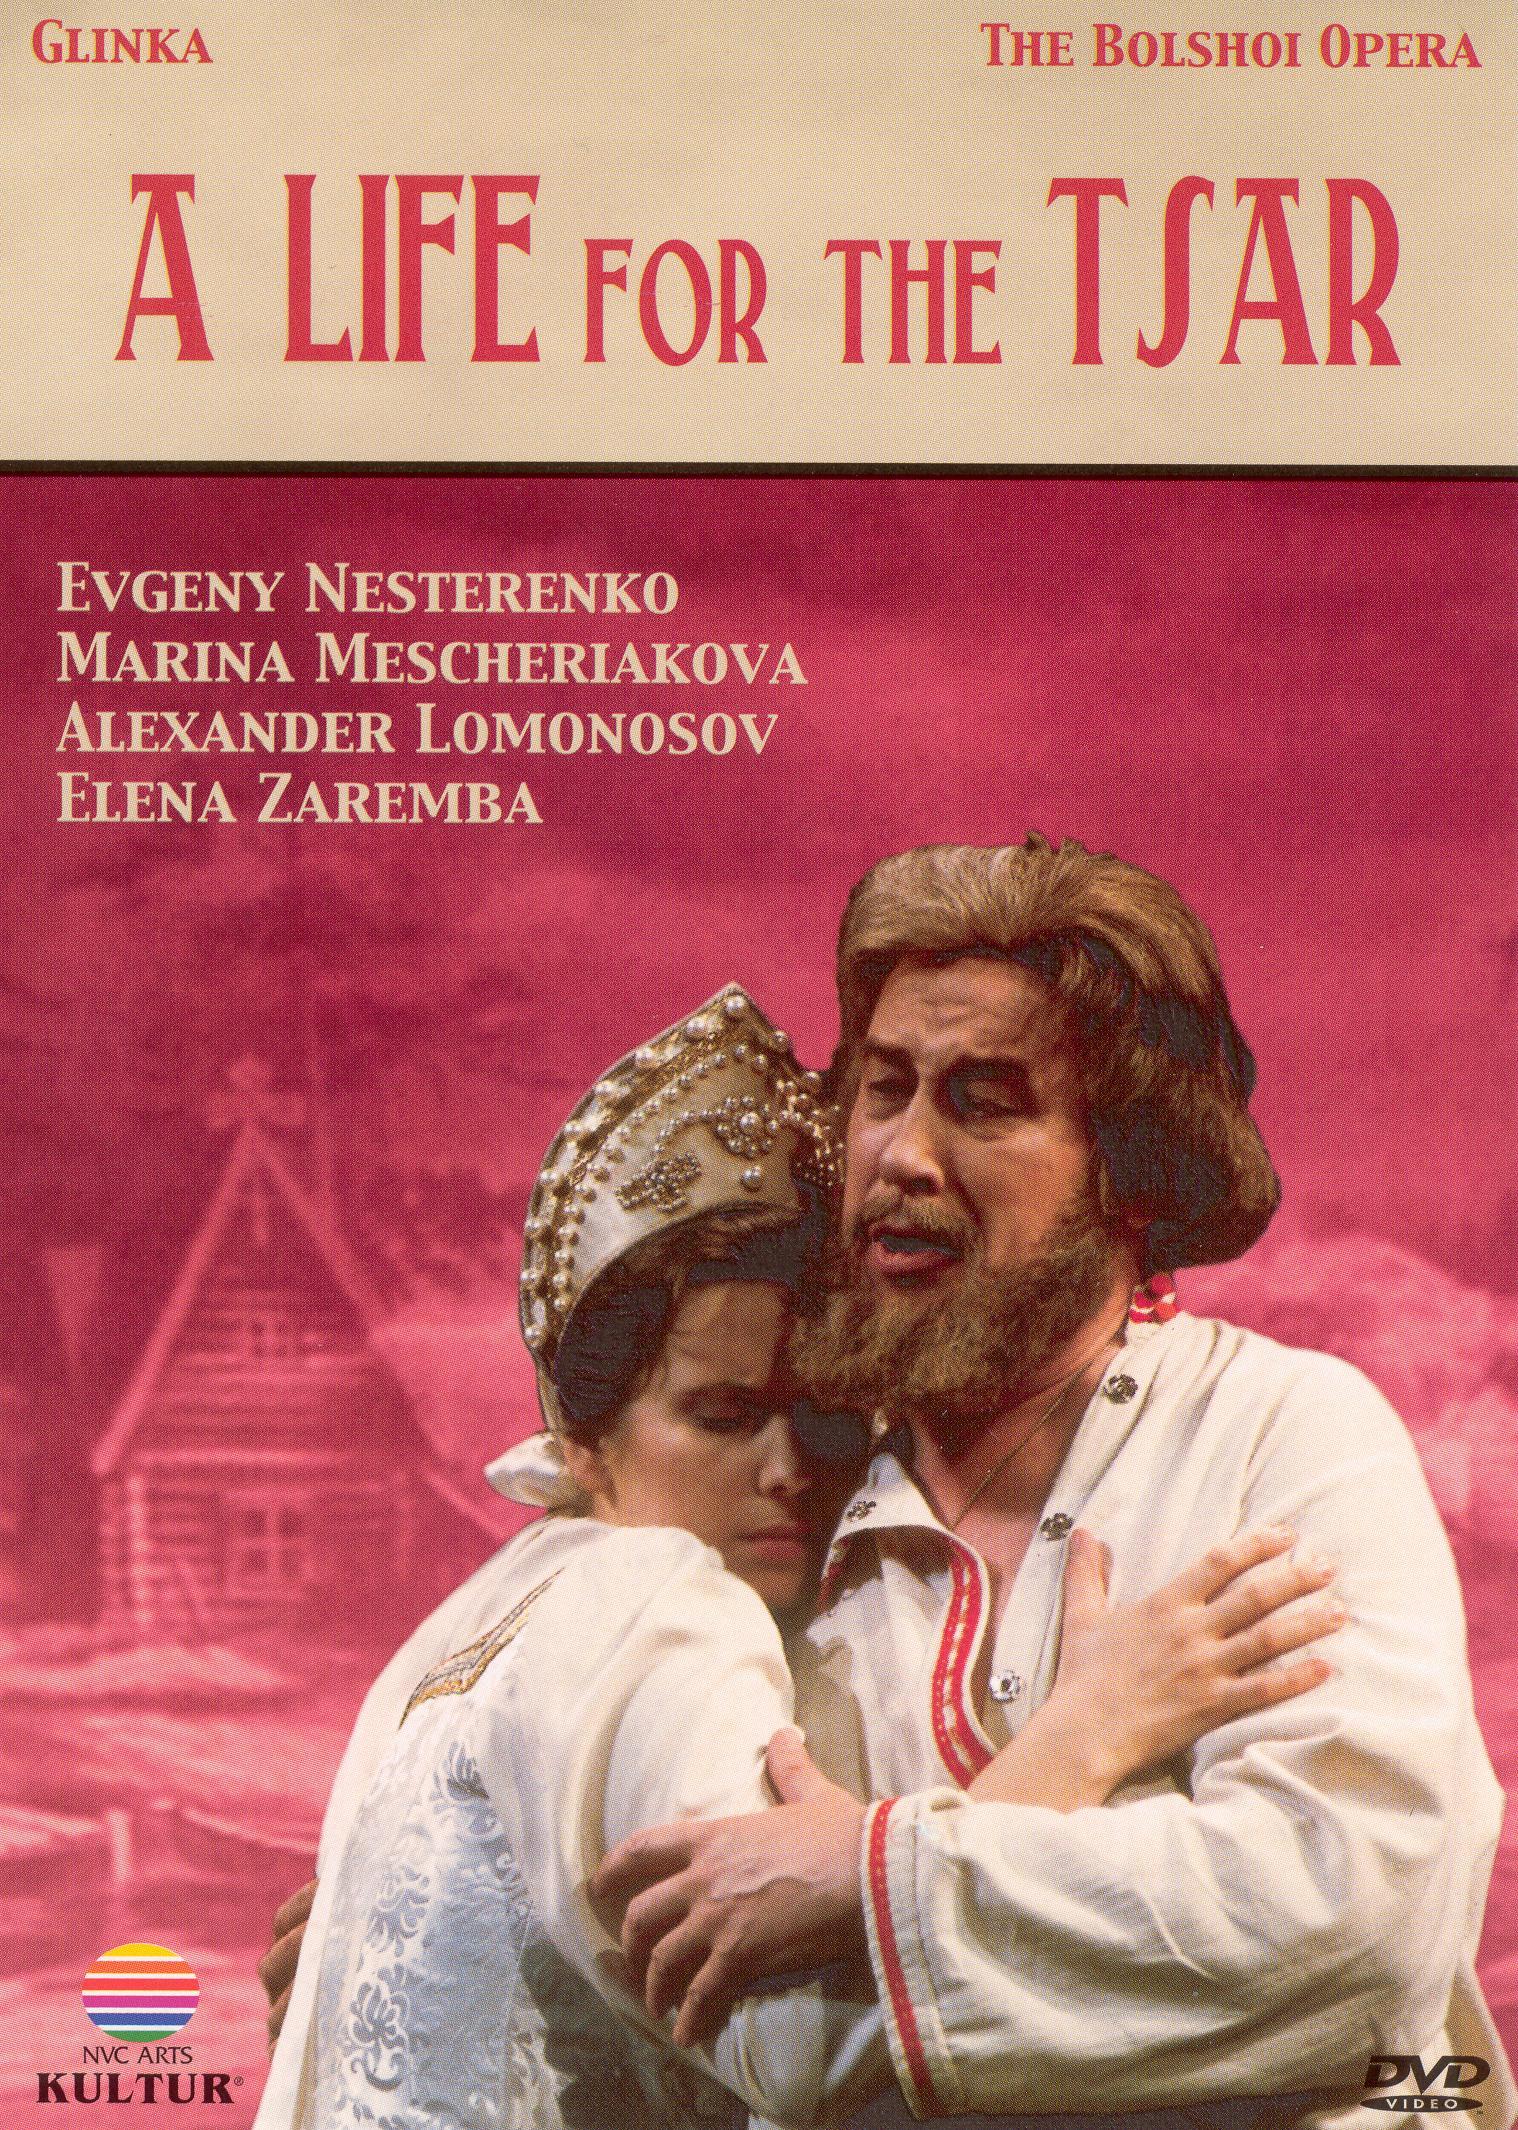 Life For the Tsar (Bolshoi Opera)